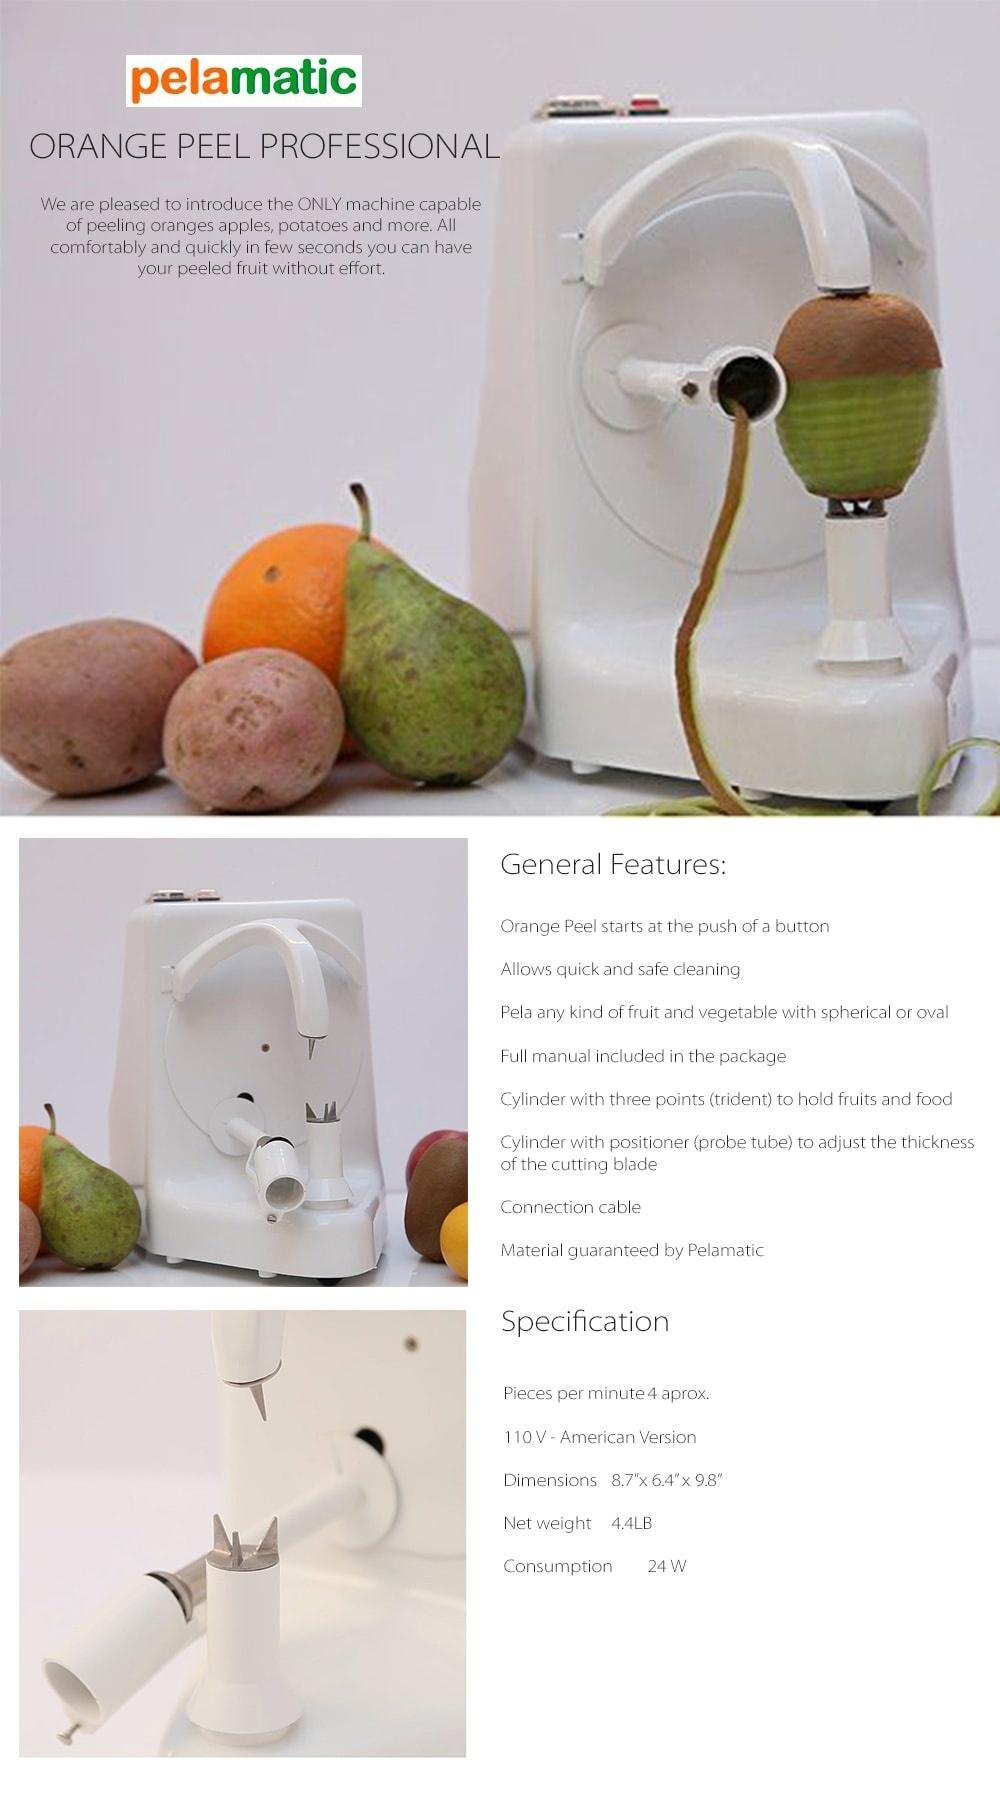 Orange Peel Professional Apollobox